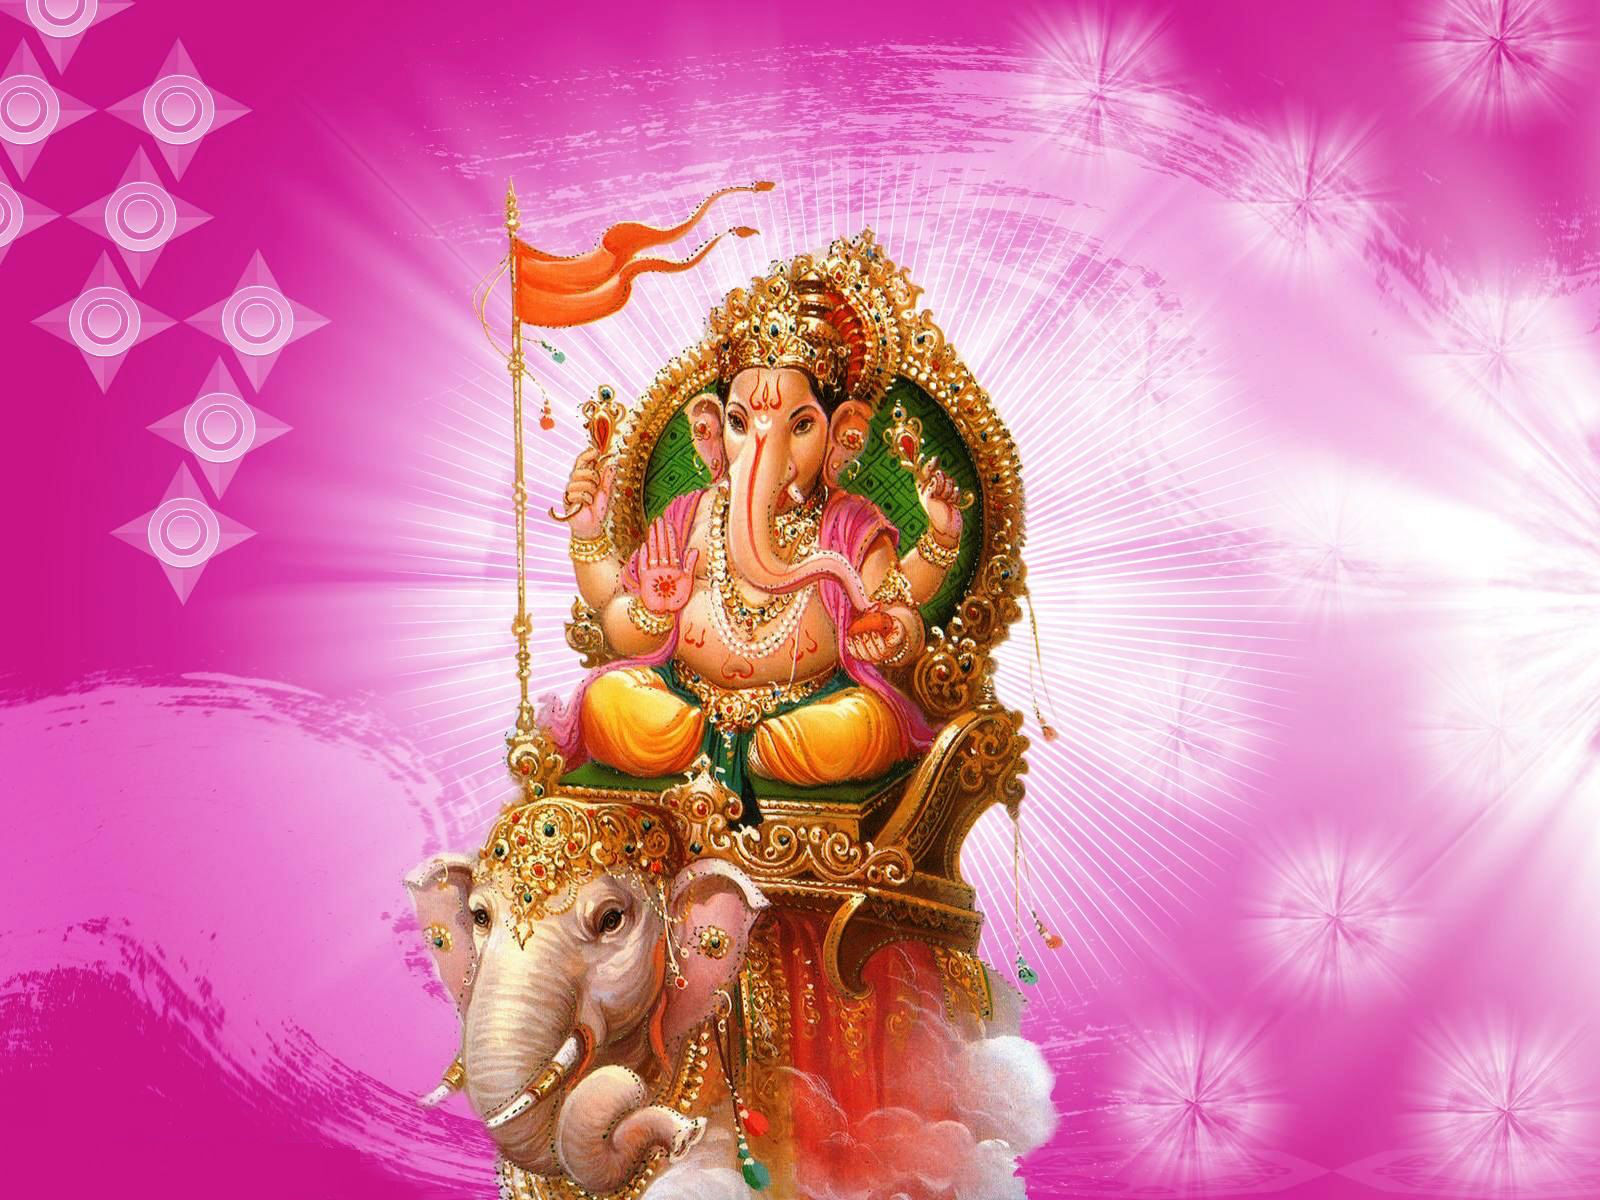 Lord Ganesha Photos: Lord Ganesh Ji Images With BhaktiBhaav